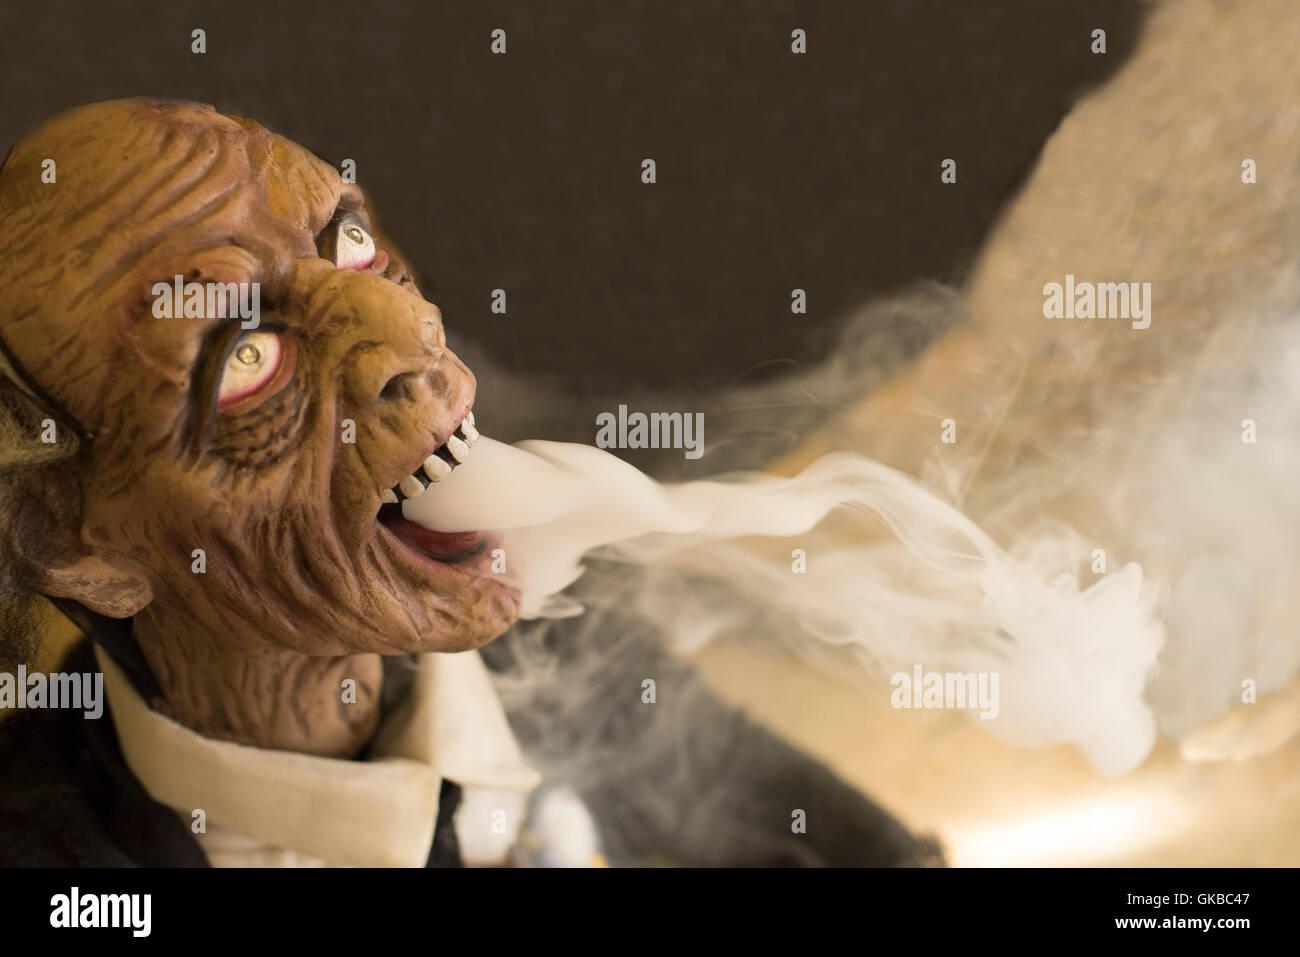 Creepy dead man mas breathing fog - Stock Image